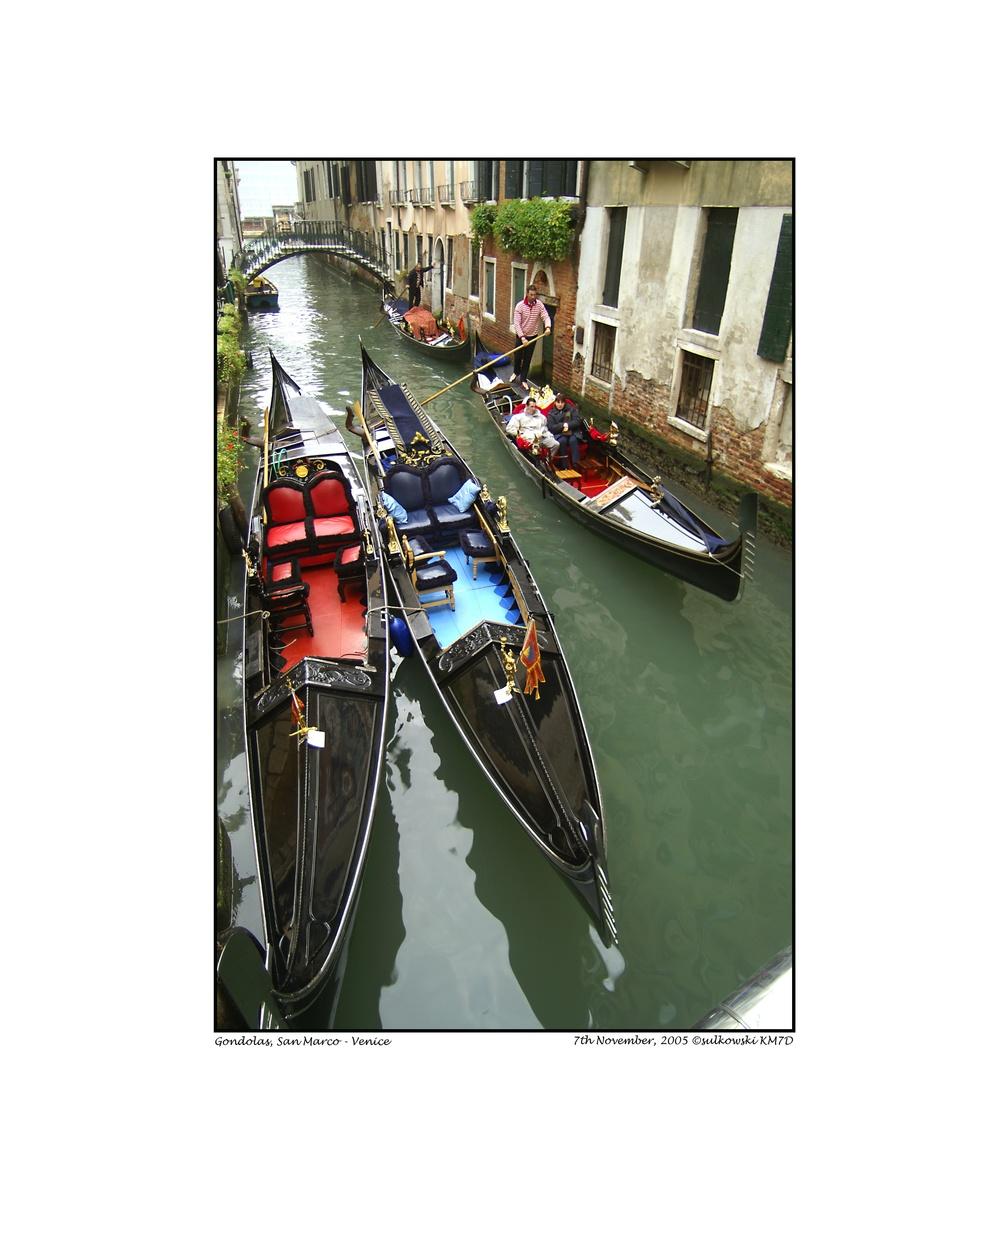 Gondolas San Marco_Venice.jpg